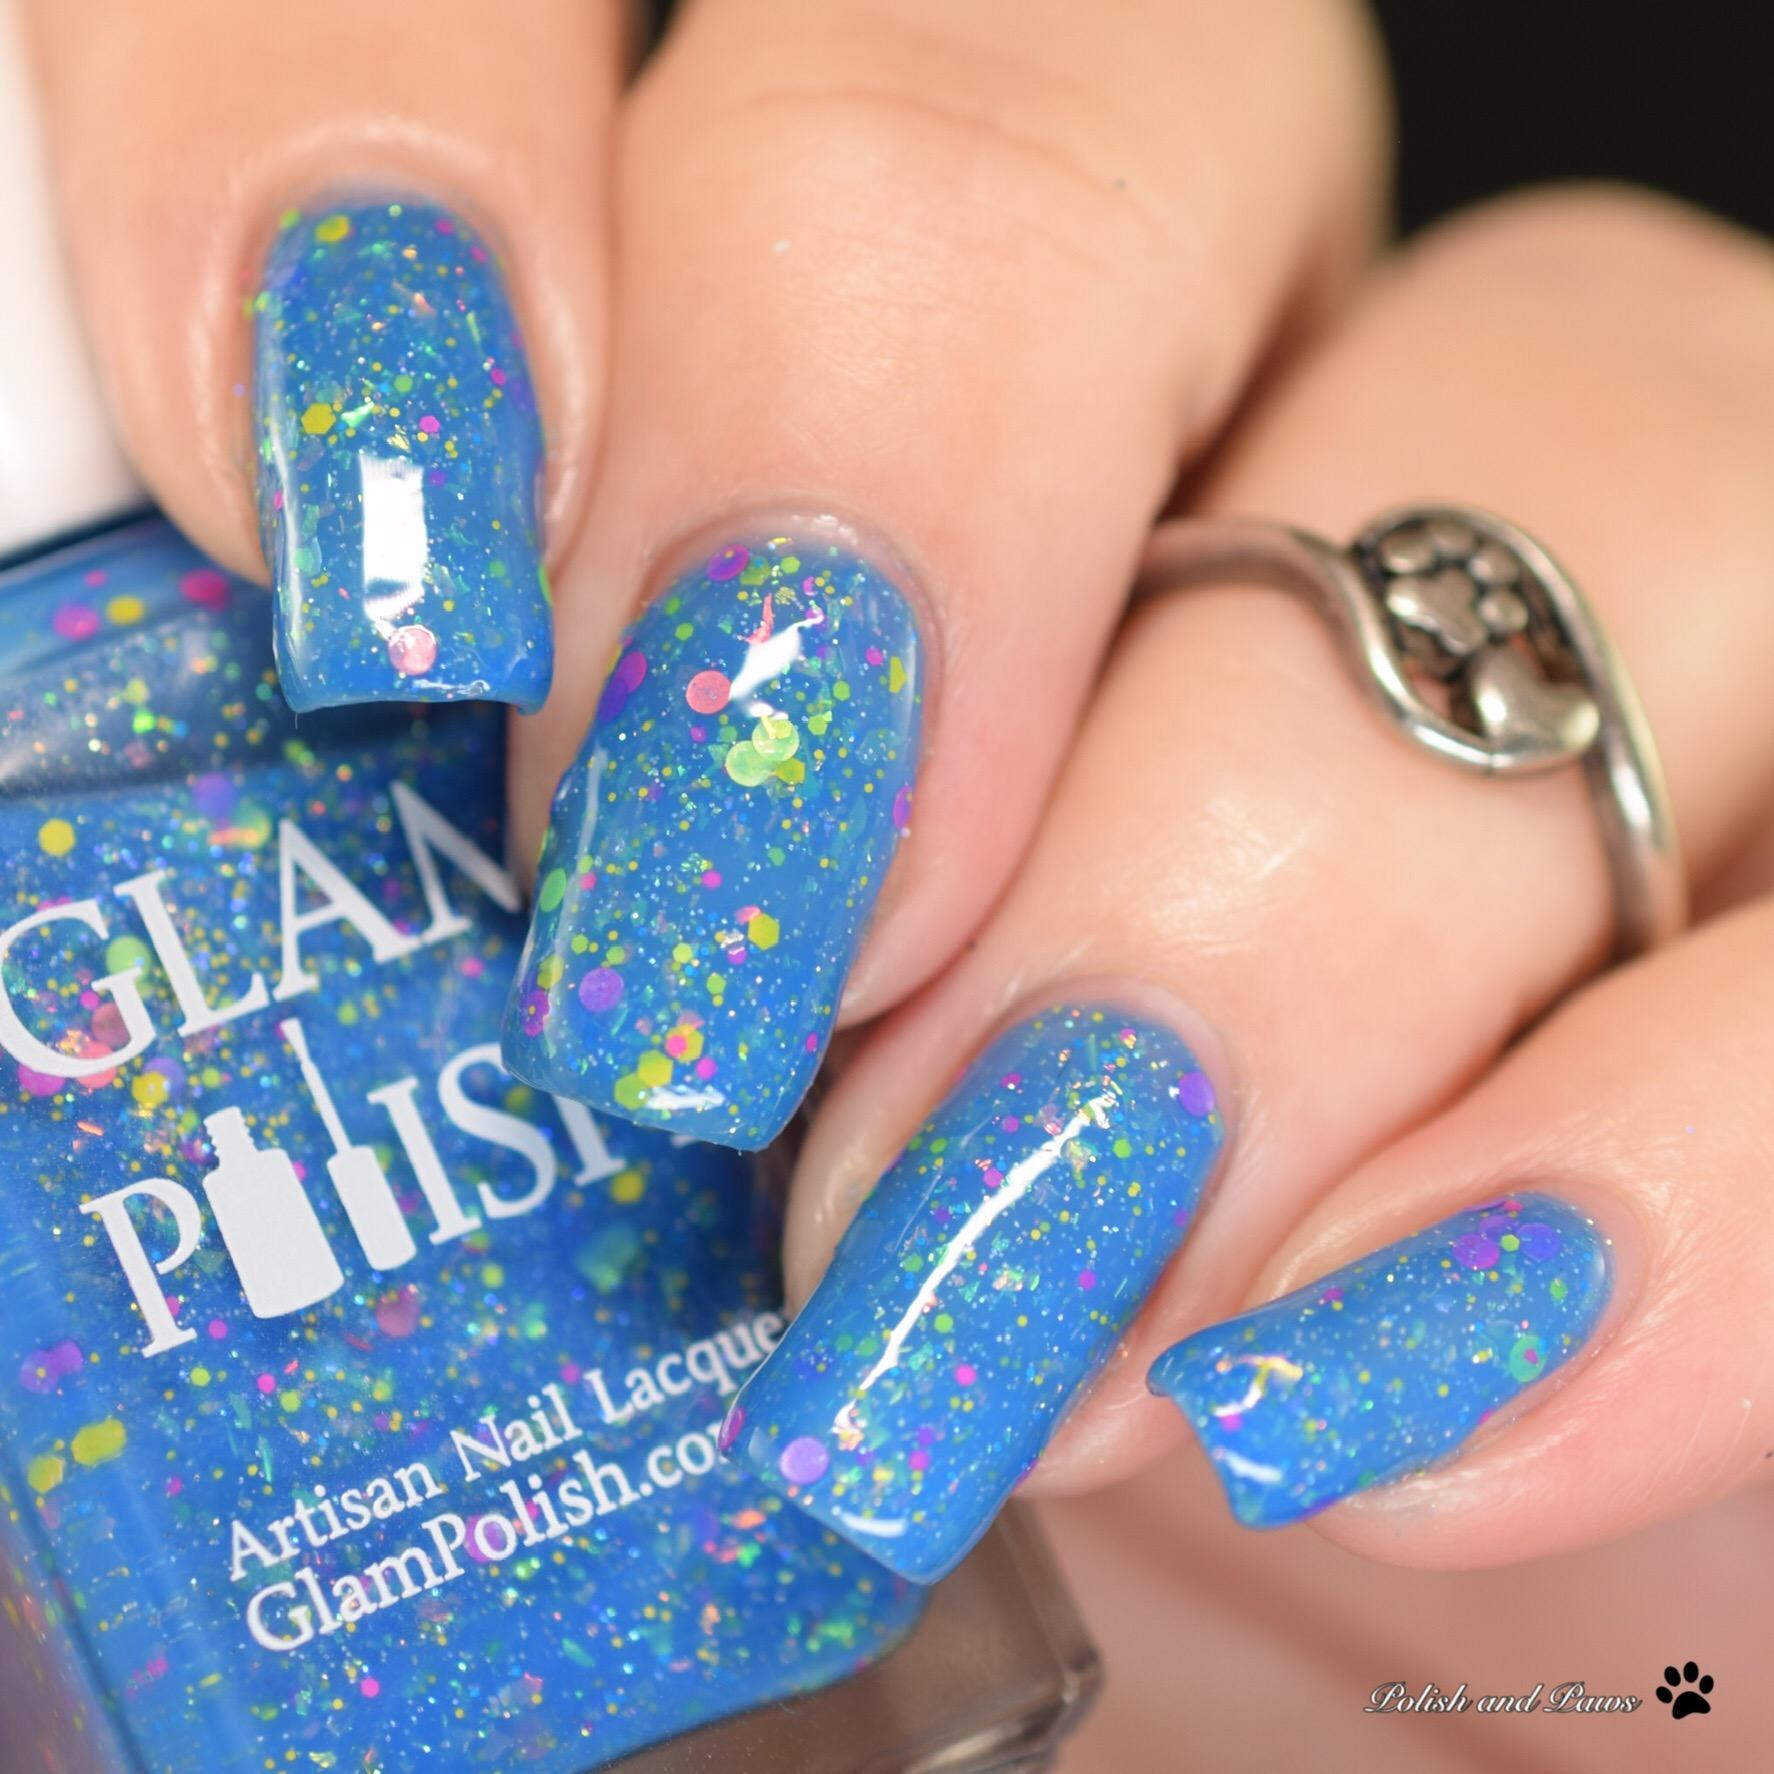 Glam Polish Sea You Soon!